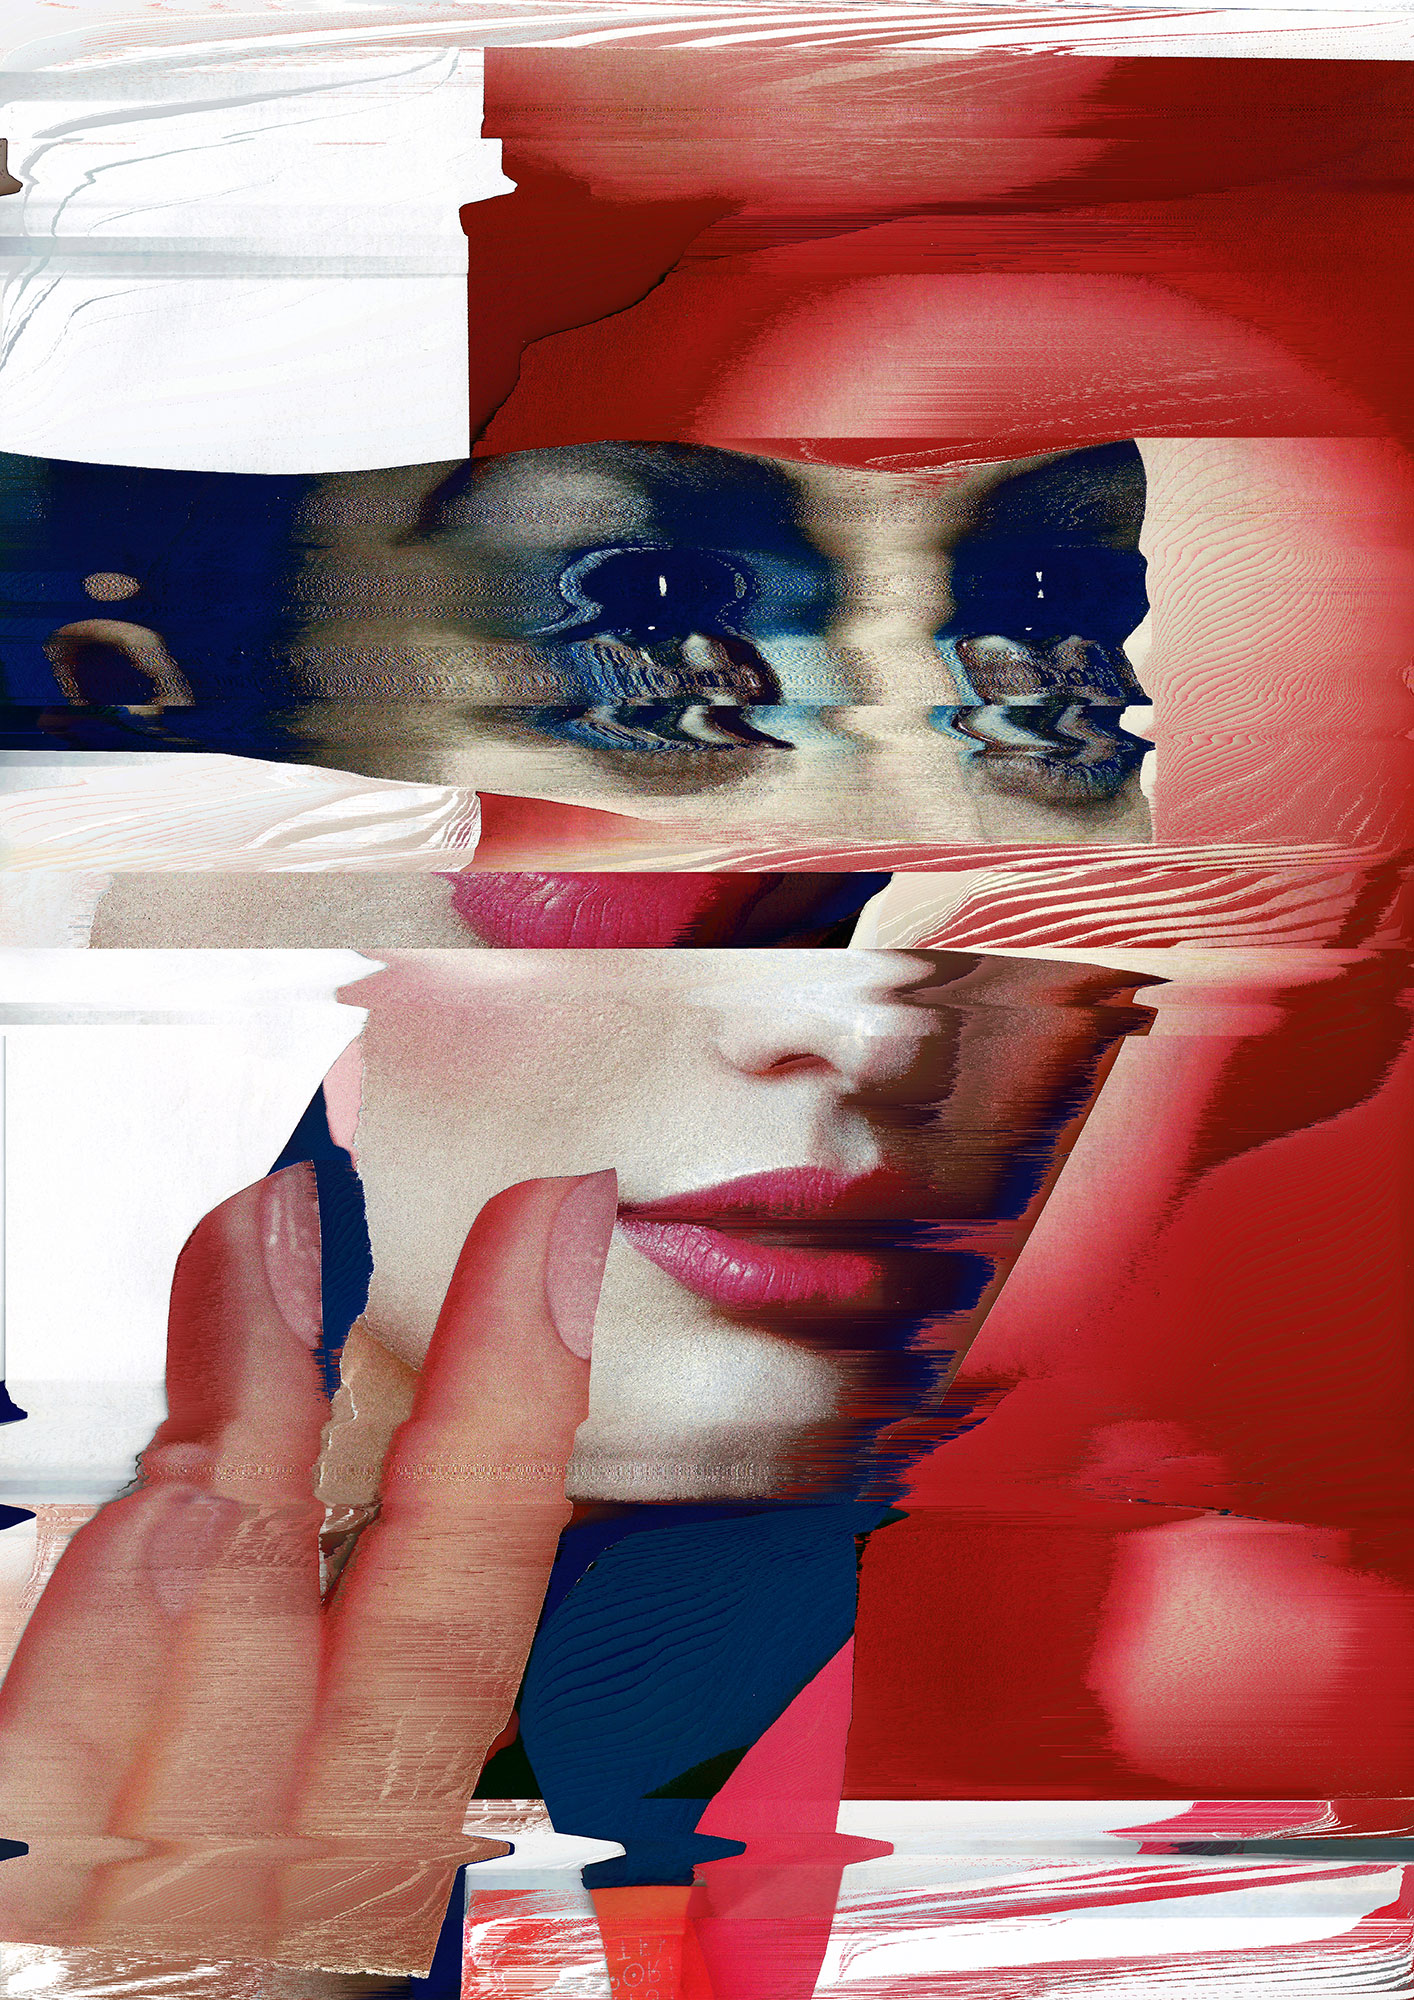 Ewa Doroszenko - Radical Beauty 18, photography